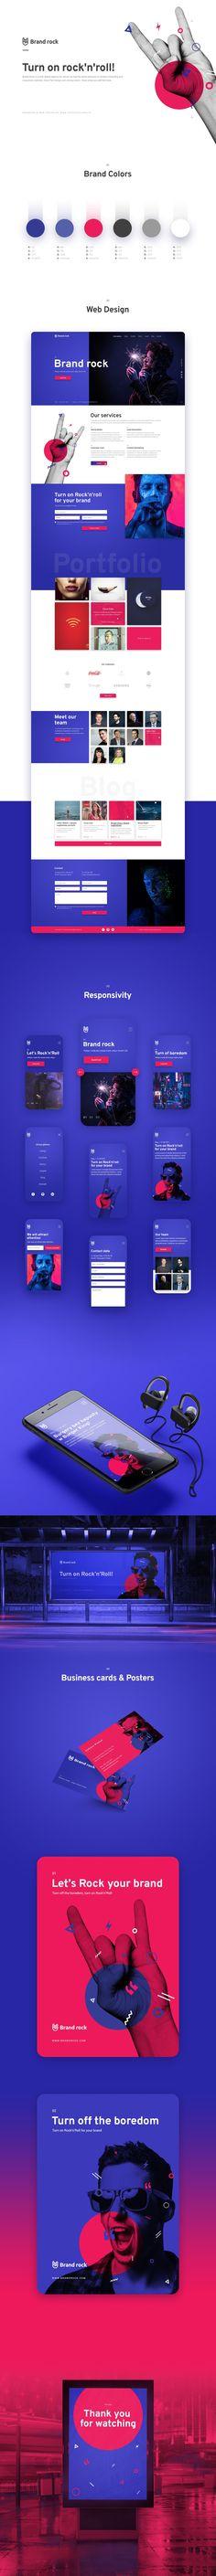 Branding and modern website design presentation Modern Website, Presentation Design, Design Agency, Branding, Colors, Brand Management, Colour, Identity Branding, Color